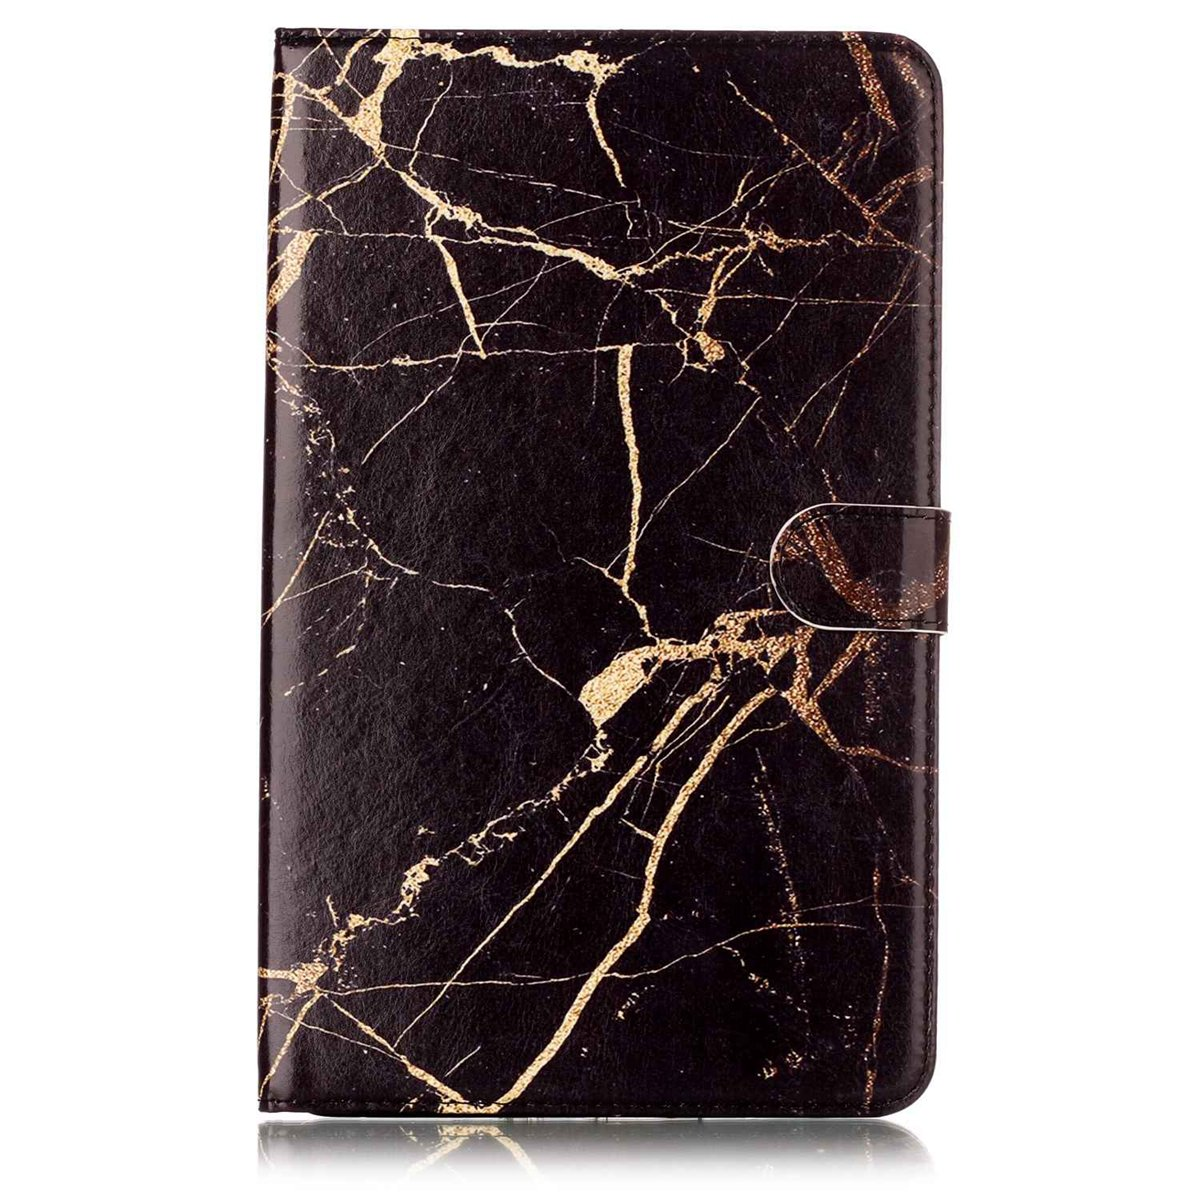 Samsung Galaxy Tab A 10.1 T580 ケース 高級本革ケース スタンド付き フリップカバー ハンドメイド Samsung Galaxy Tab A 10.1 T580 (スタイル6)   B07LCJK122